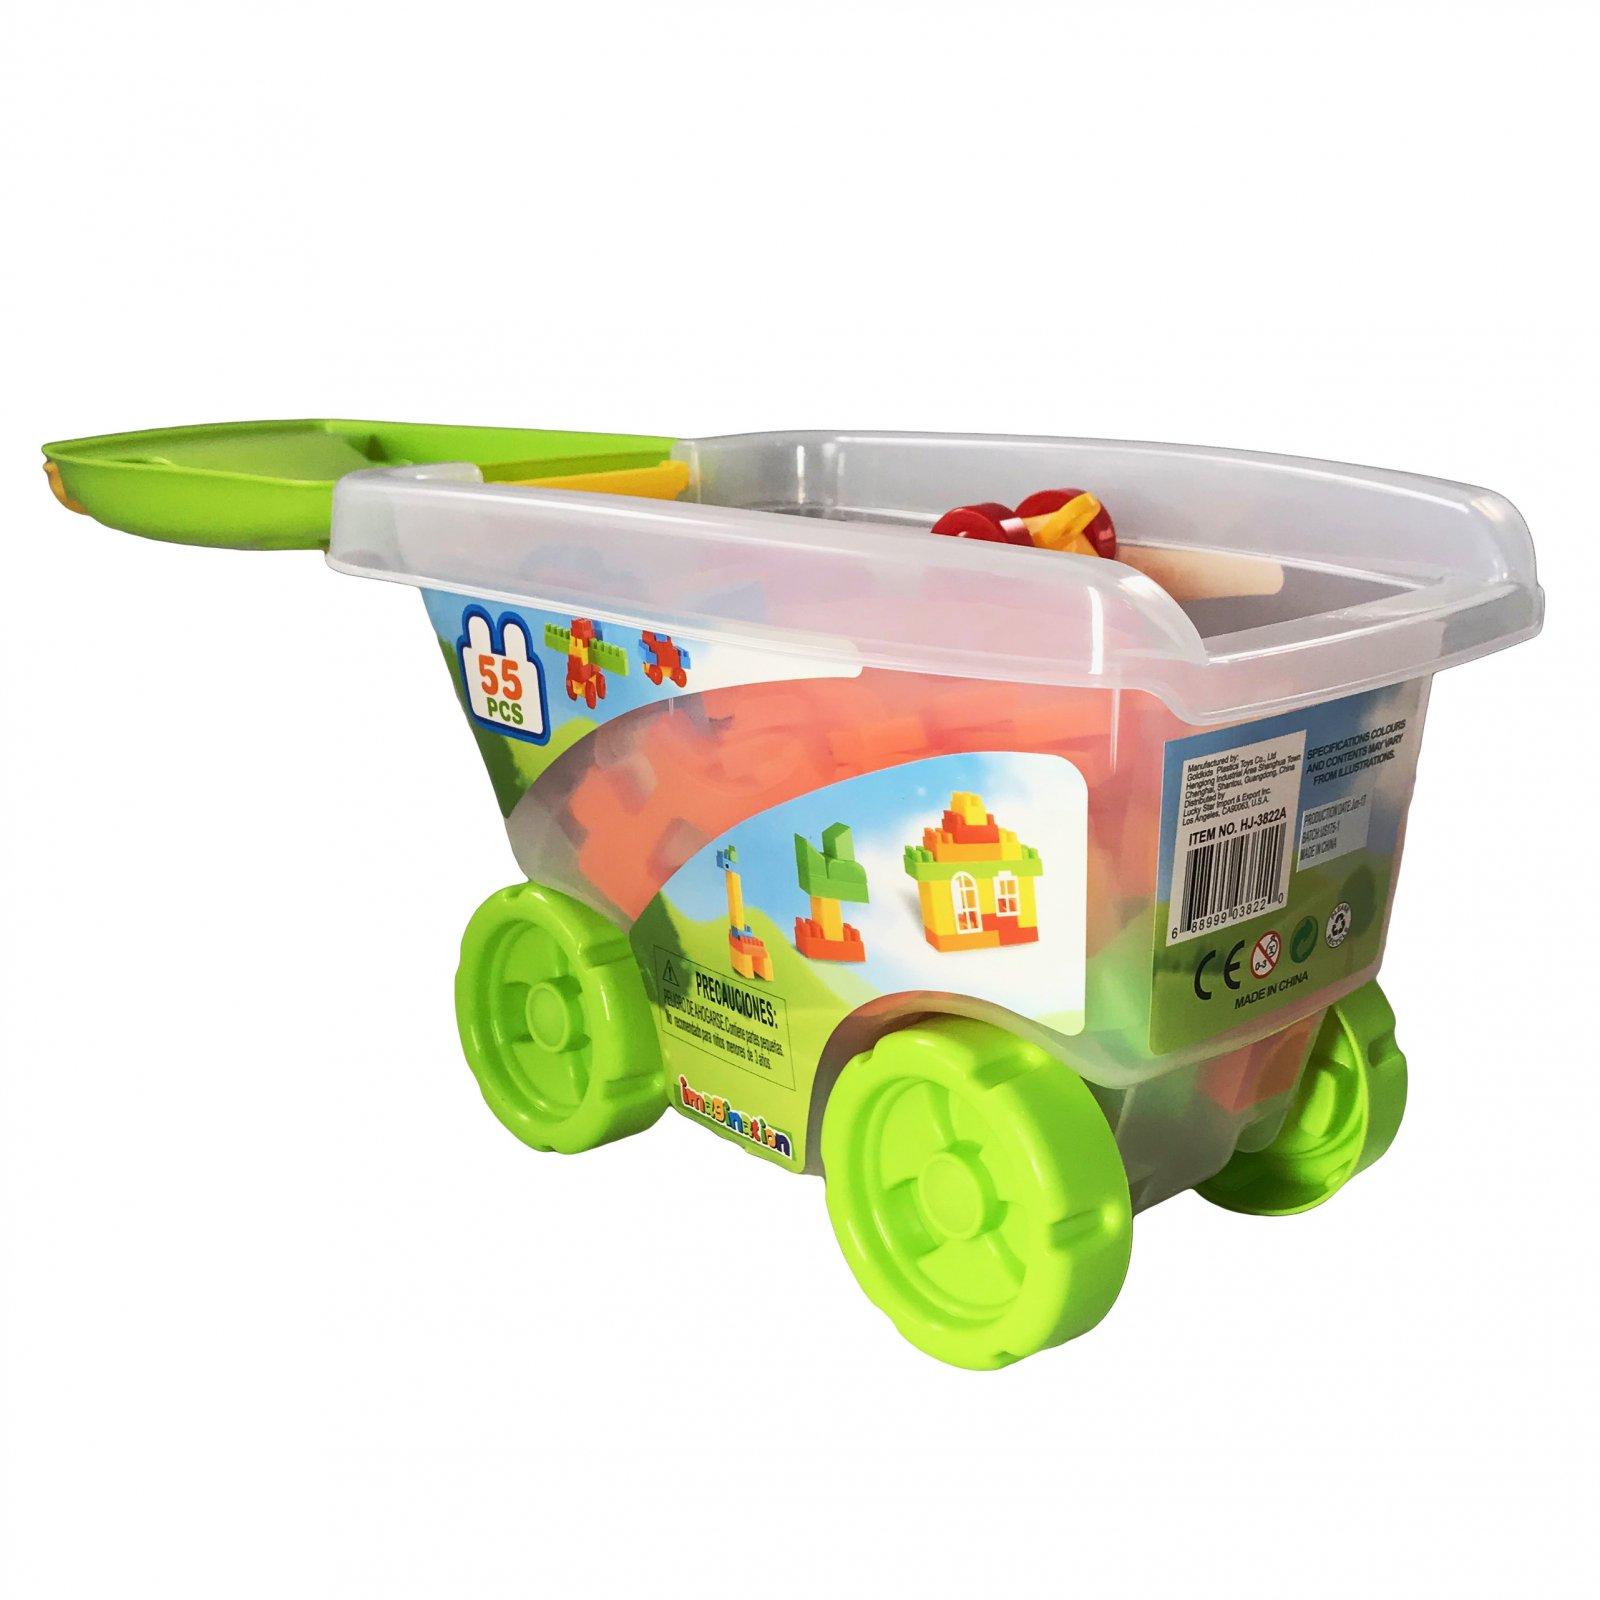 55 Piece Educational Blocks Cart Play Set - Green